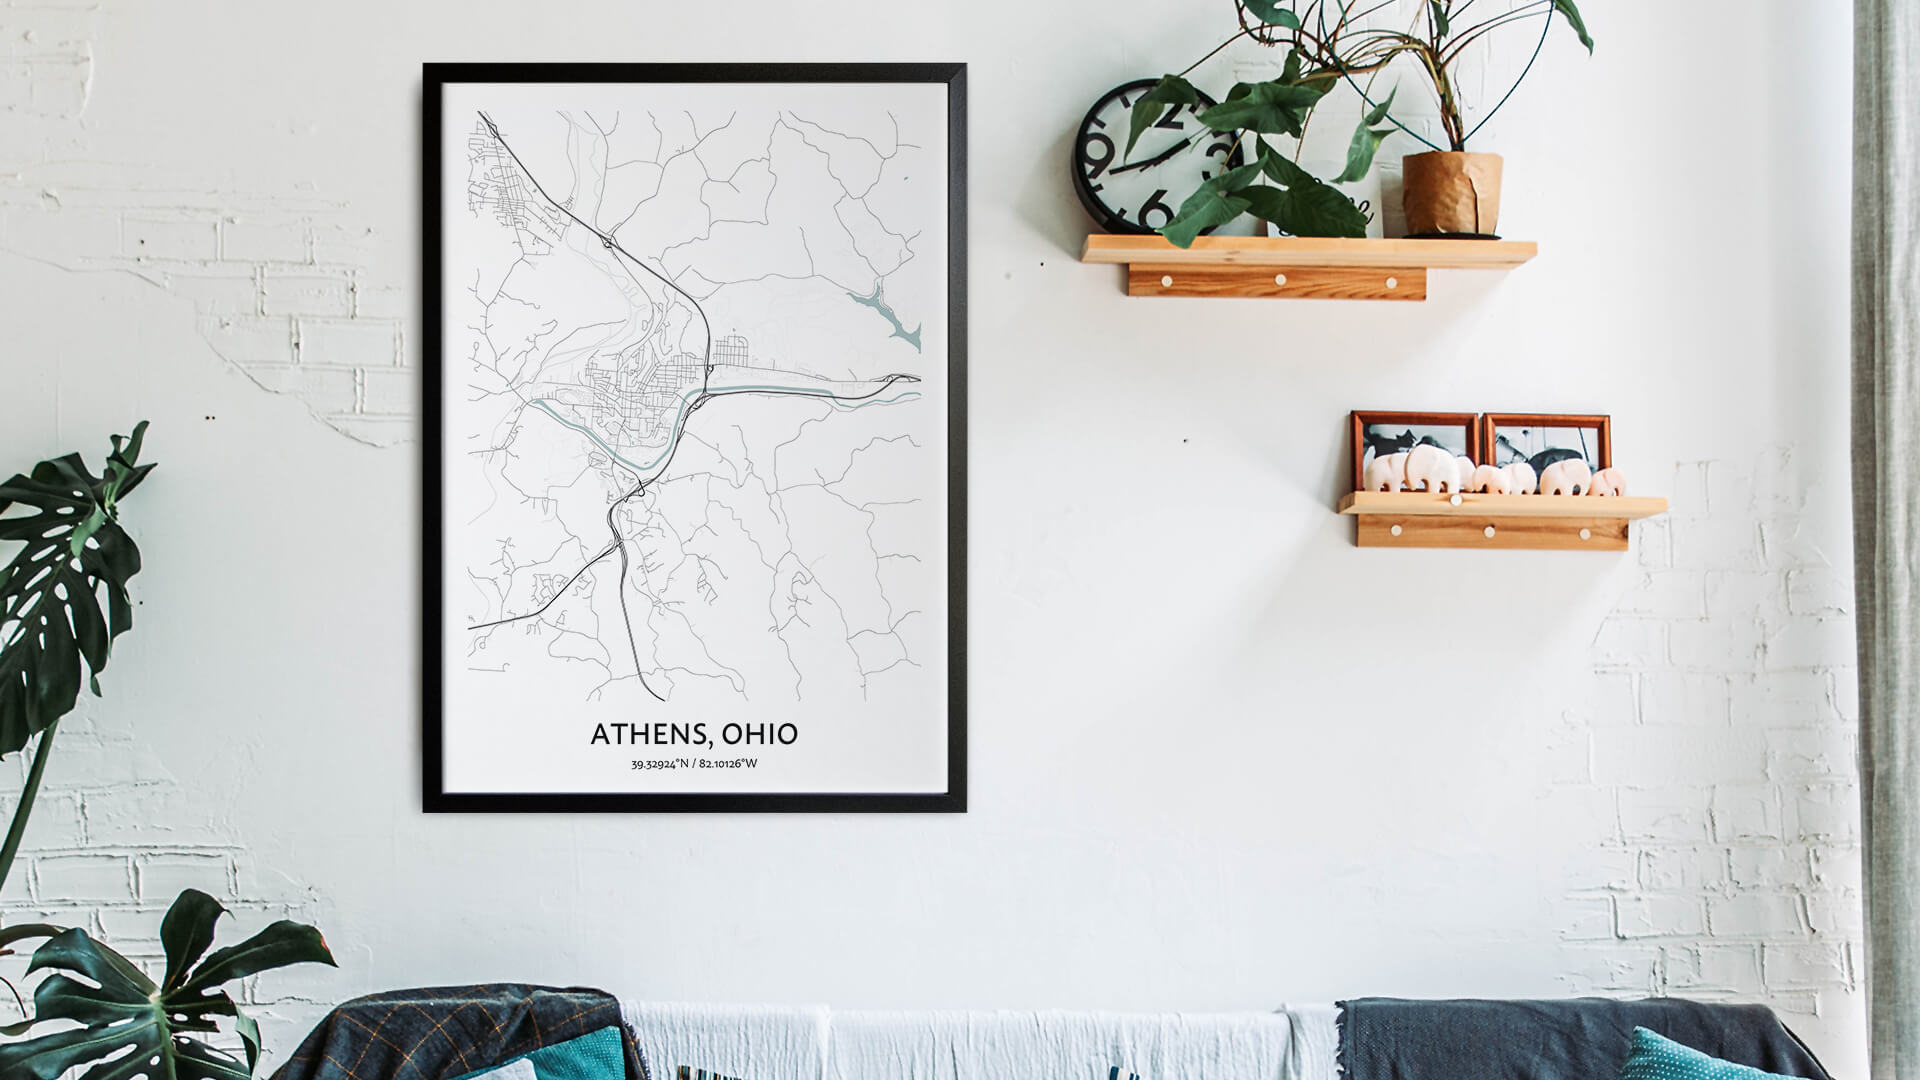 Athens Ohio map art